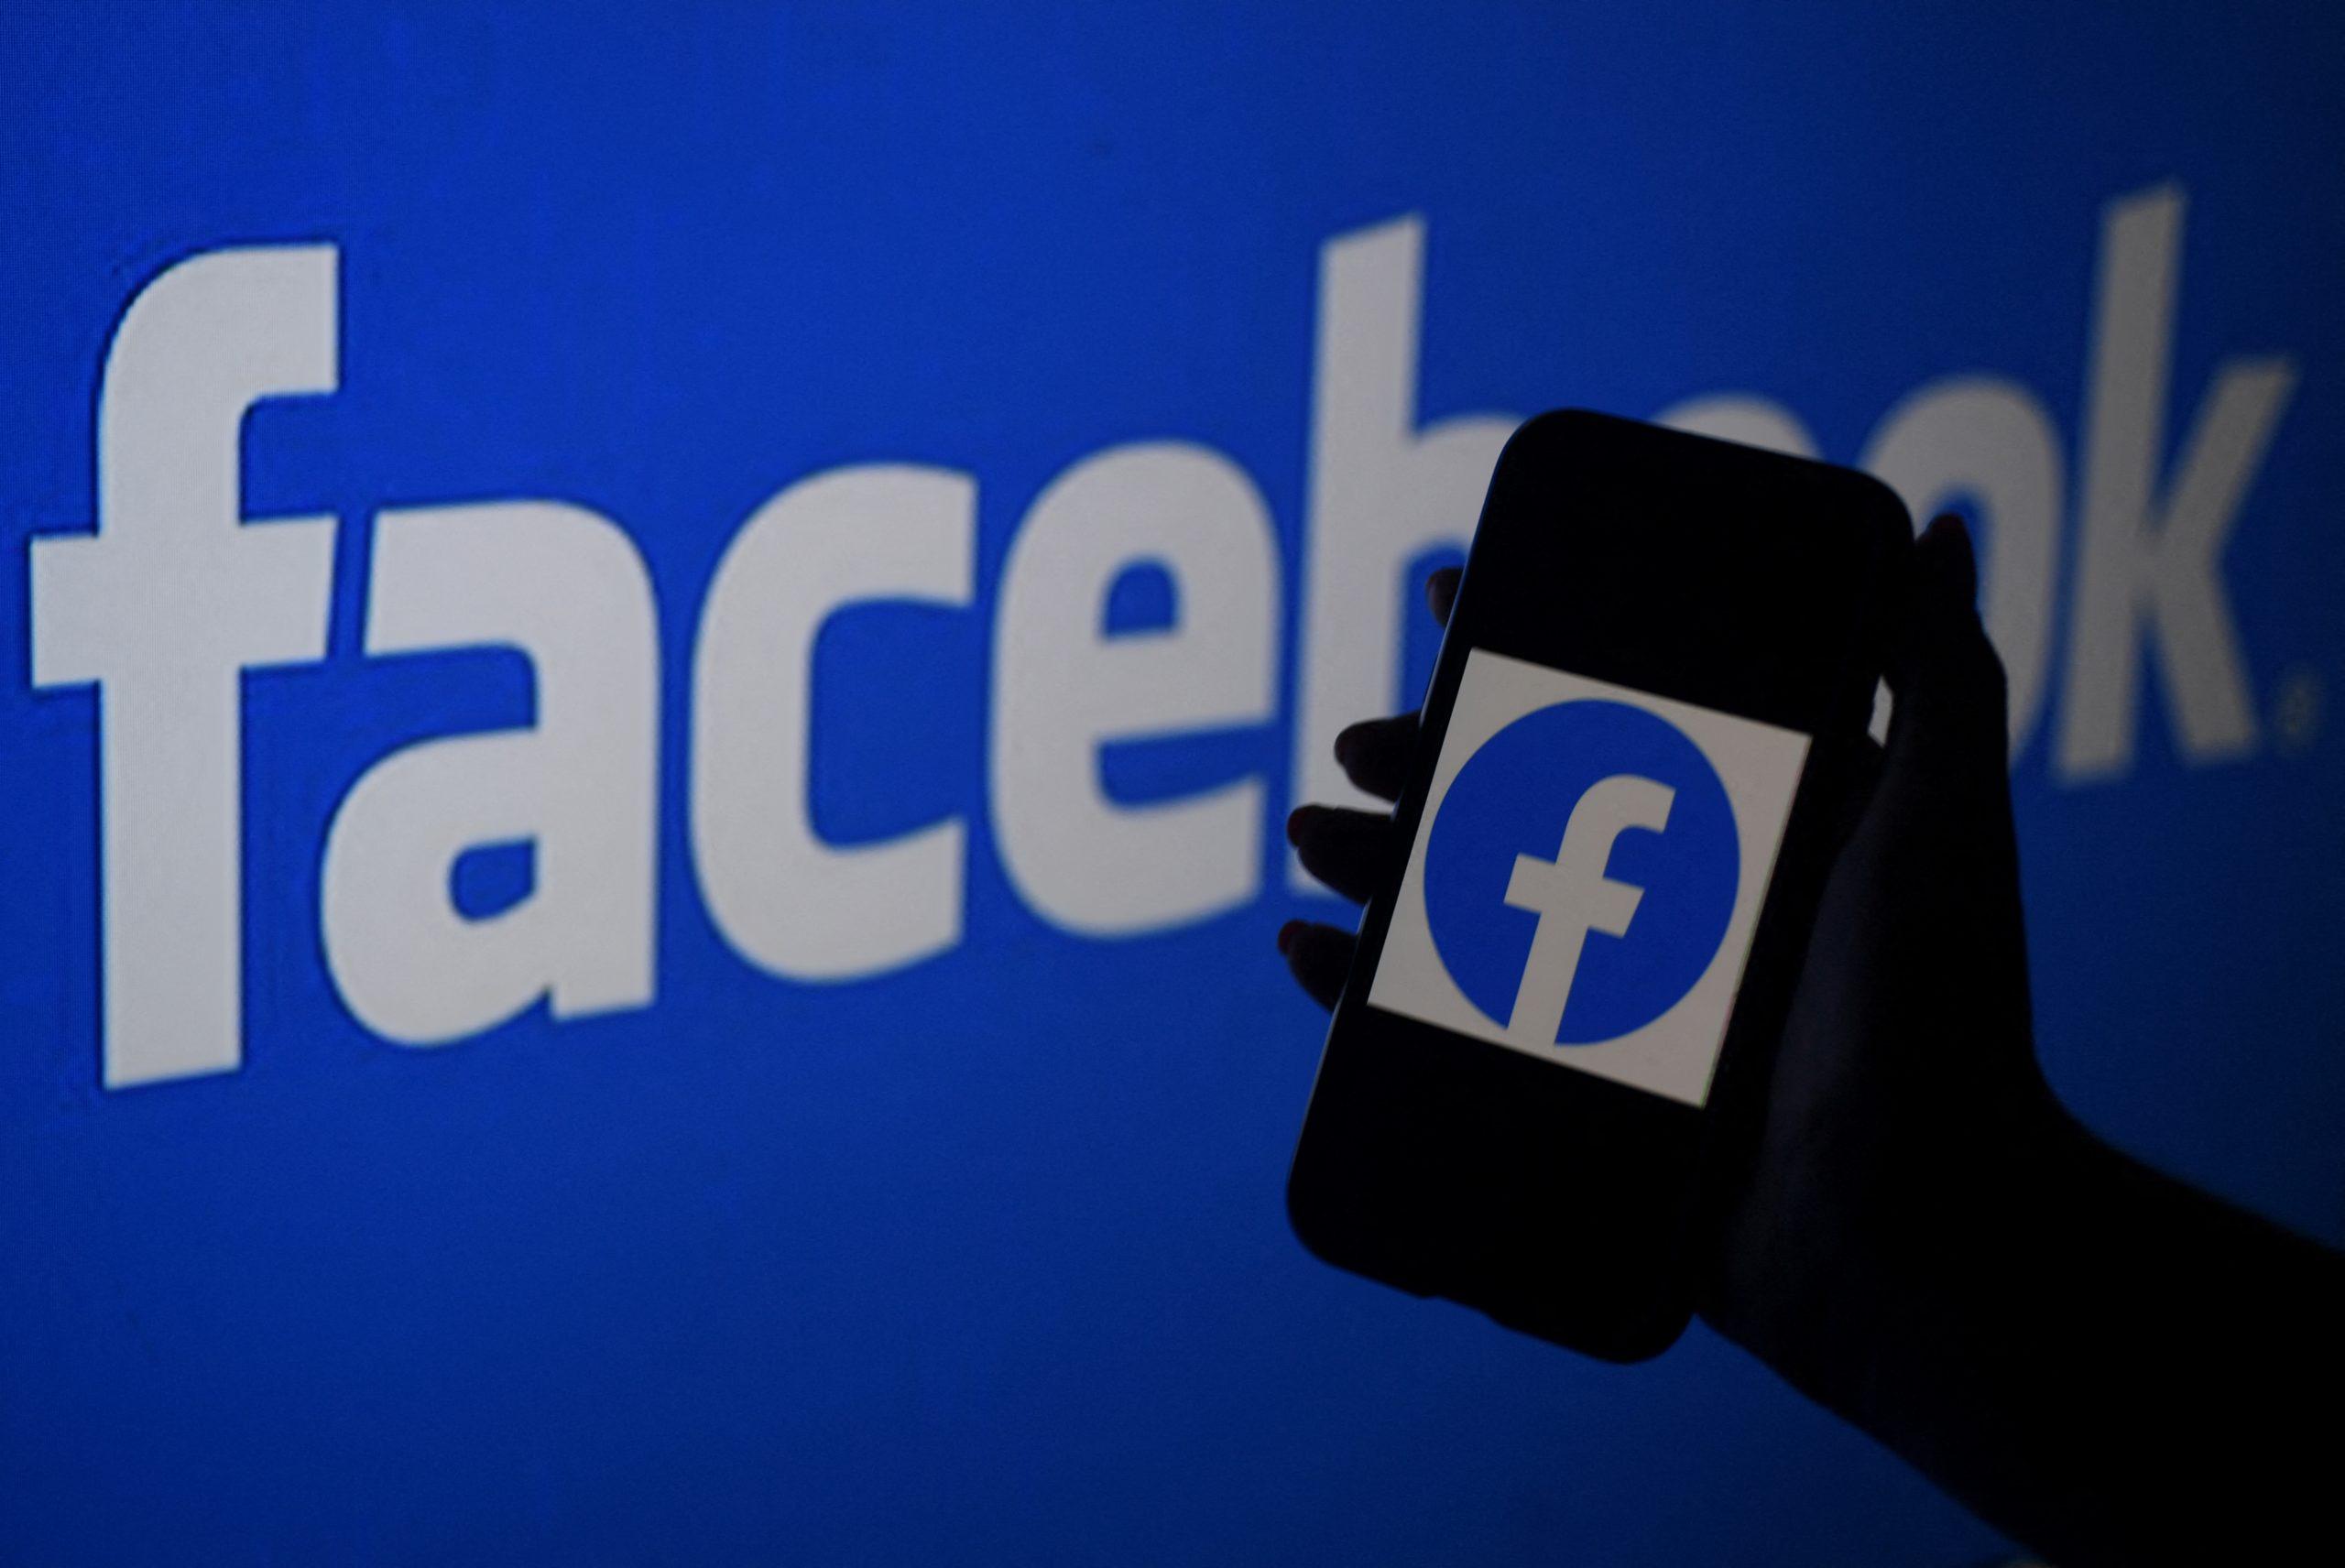 A smart phone screen displays the logo of Facebook on a Facebook website background in Arlington, Virginia on April 07, 2021. (AFP)